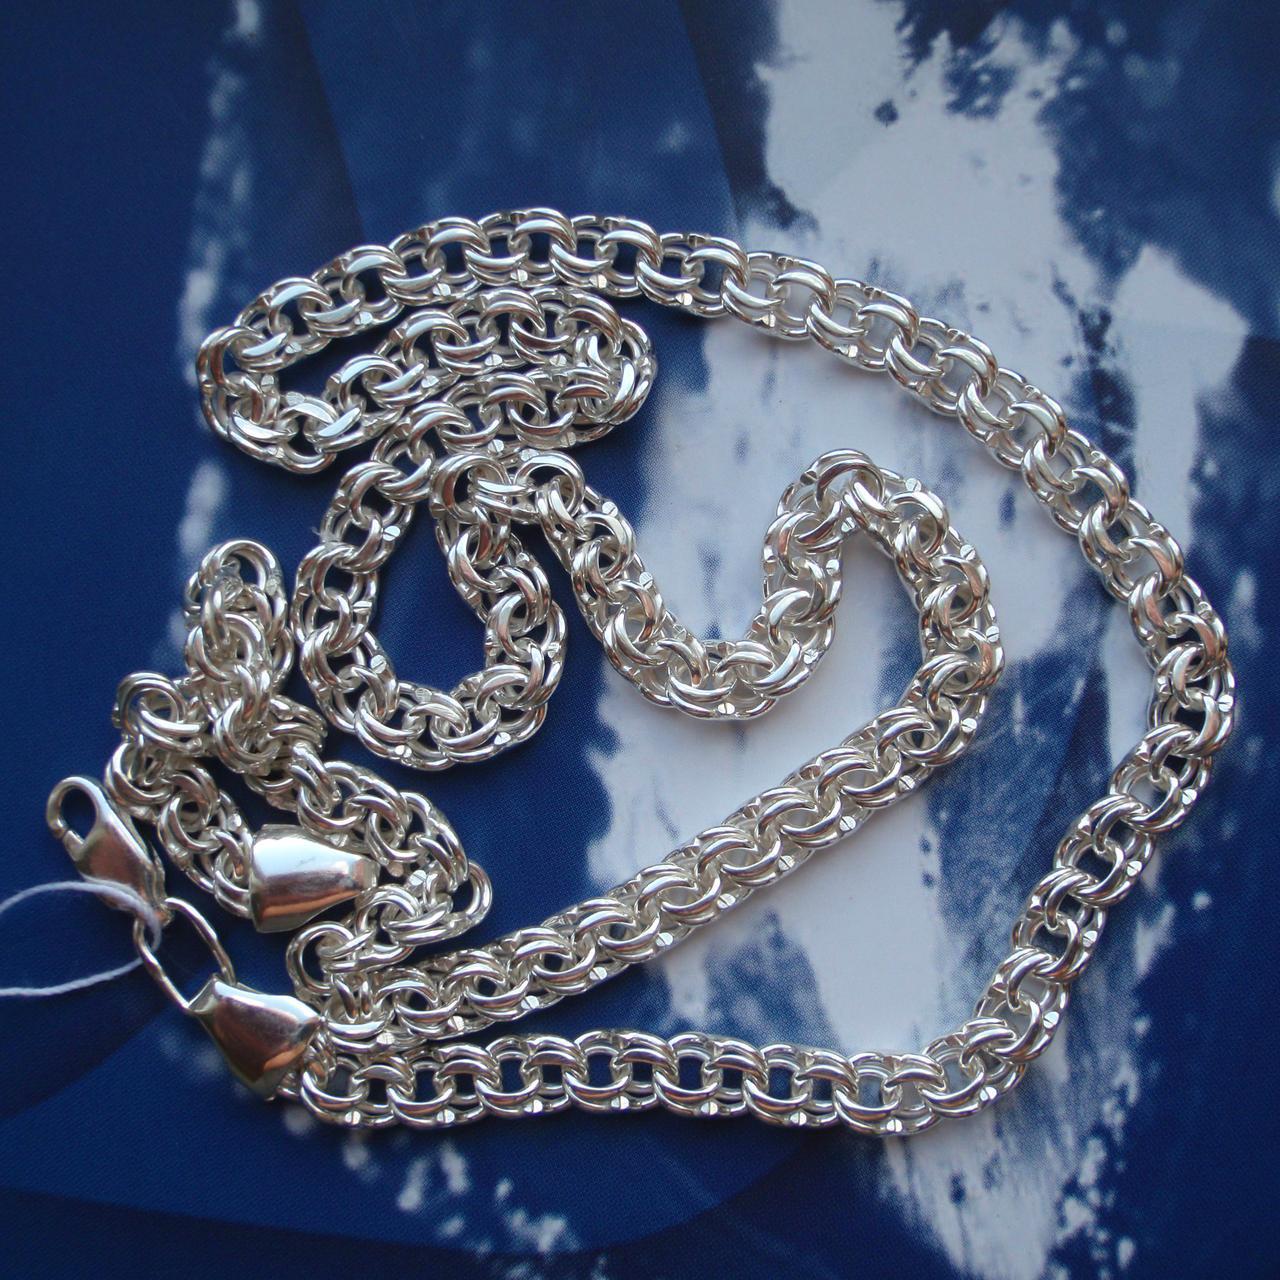 Серебряная цепочка, 500мм, 22 грамма, плетение Бисмарк, светлое серебро